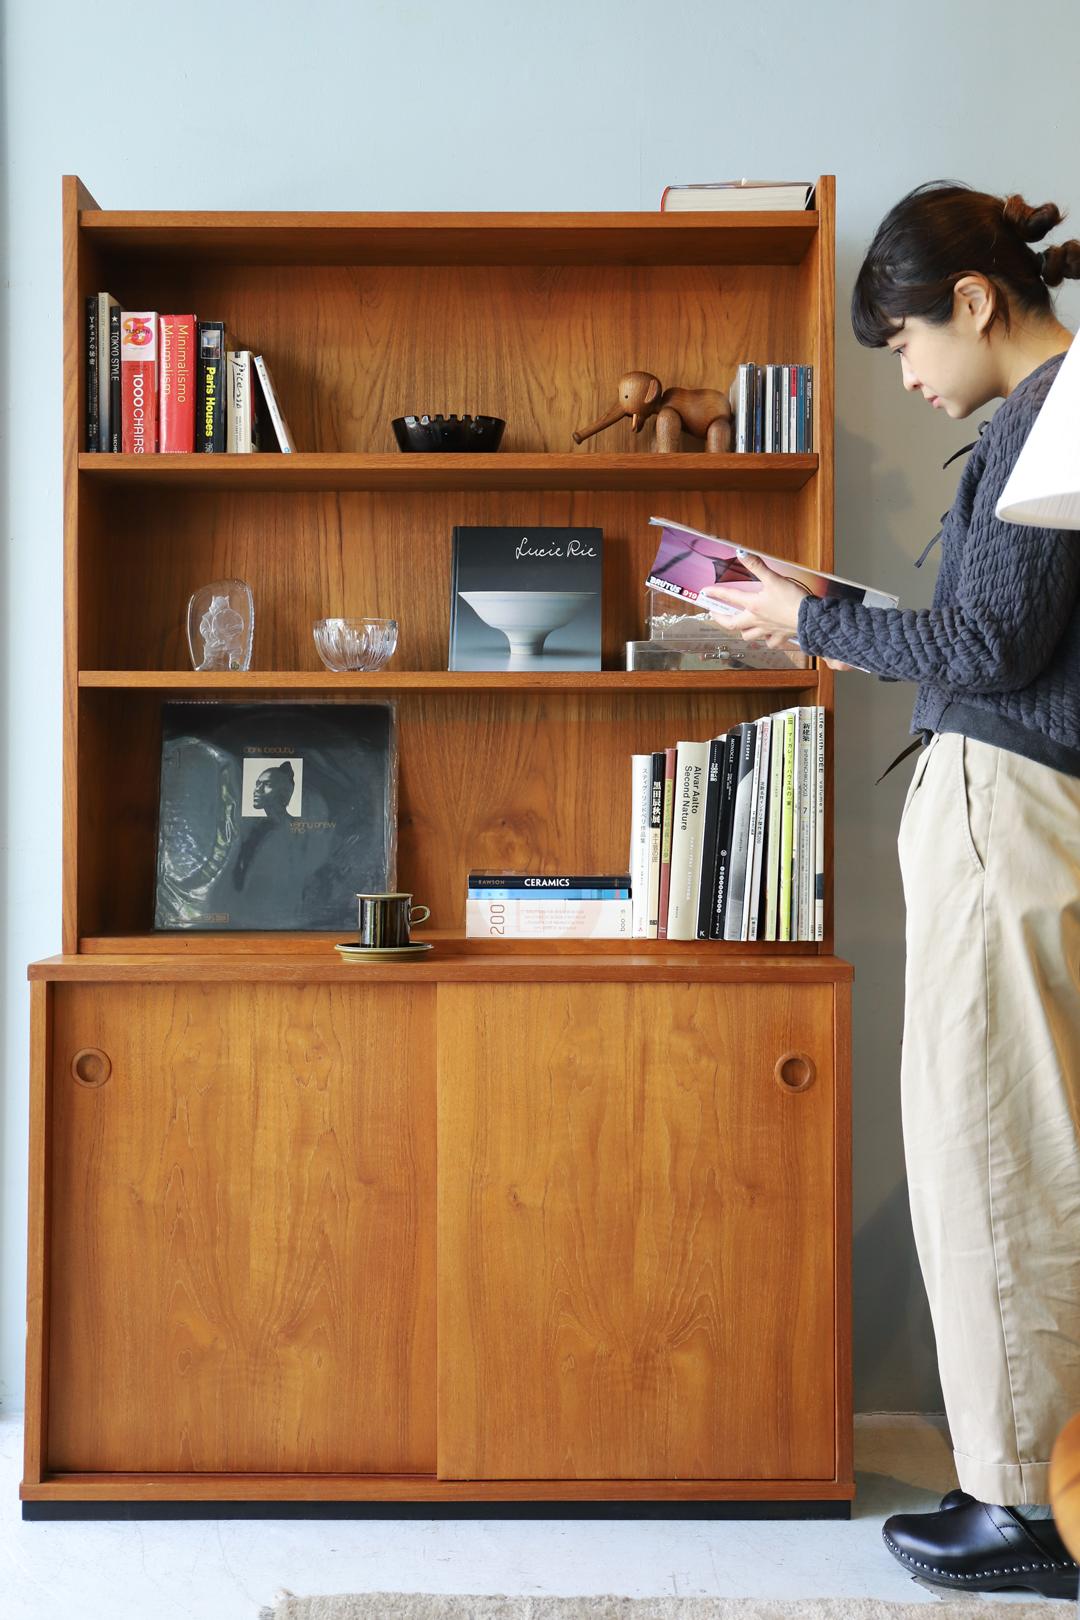 Danish Vintage Book Case Cabinet/デンマーク ヴィンテージ ブックケース キャビネット シェルフ 本棚 チーク材 収納 北欧家具